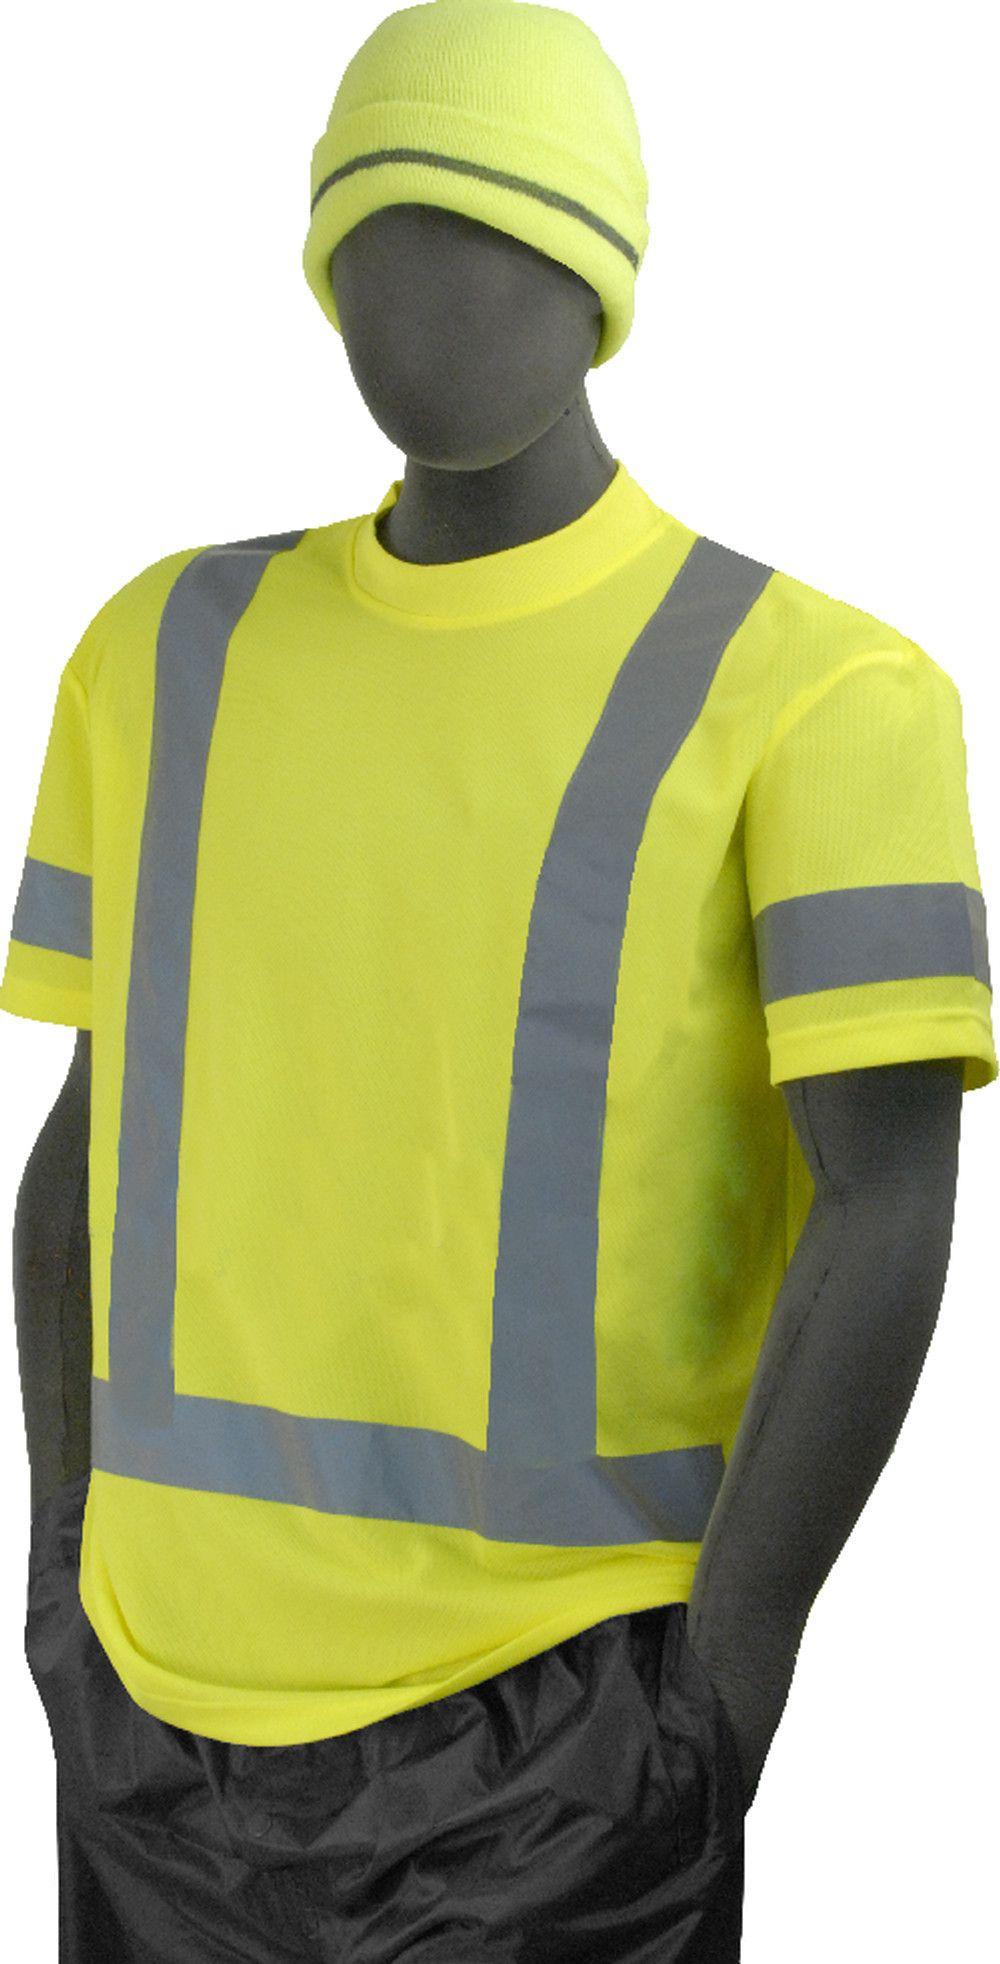 Majestic 755303 Hi Vis Yellow Safety TShirt ANSI Class 3